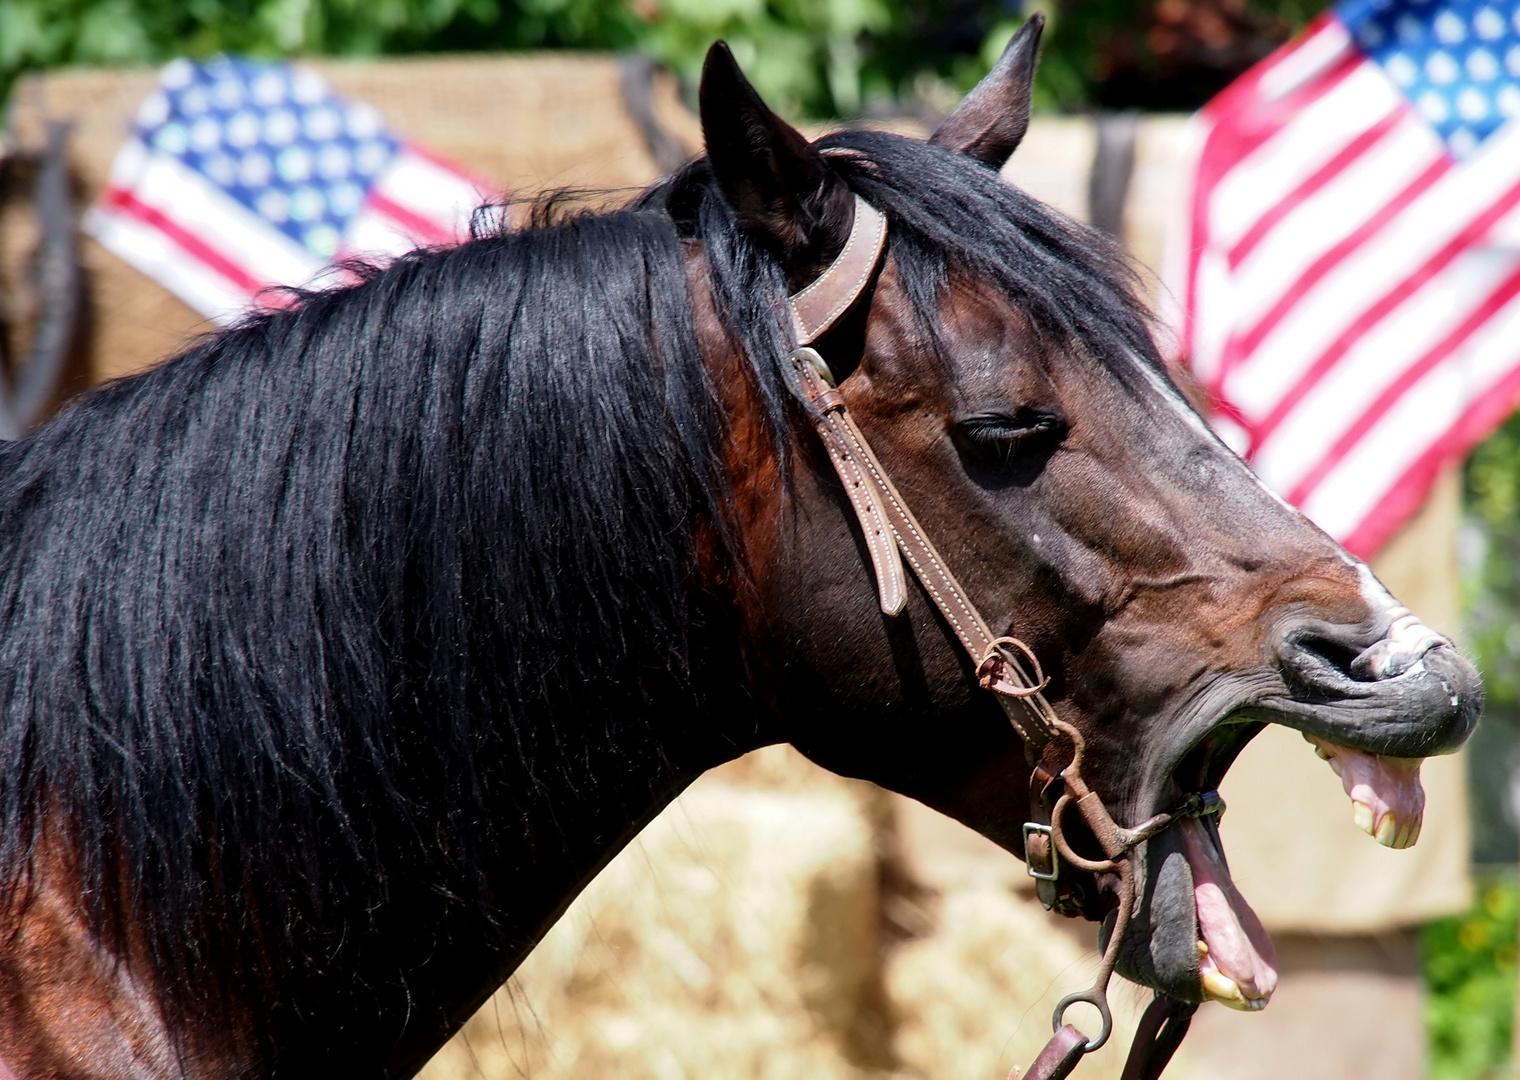 Da lacht ja das Pferd!